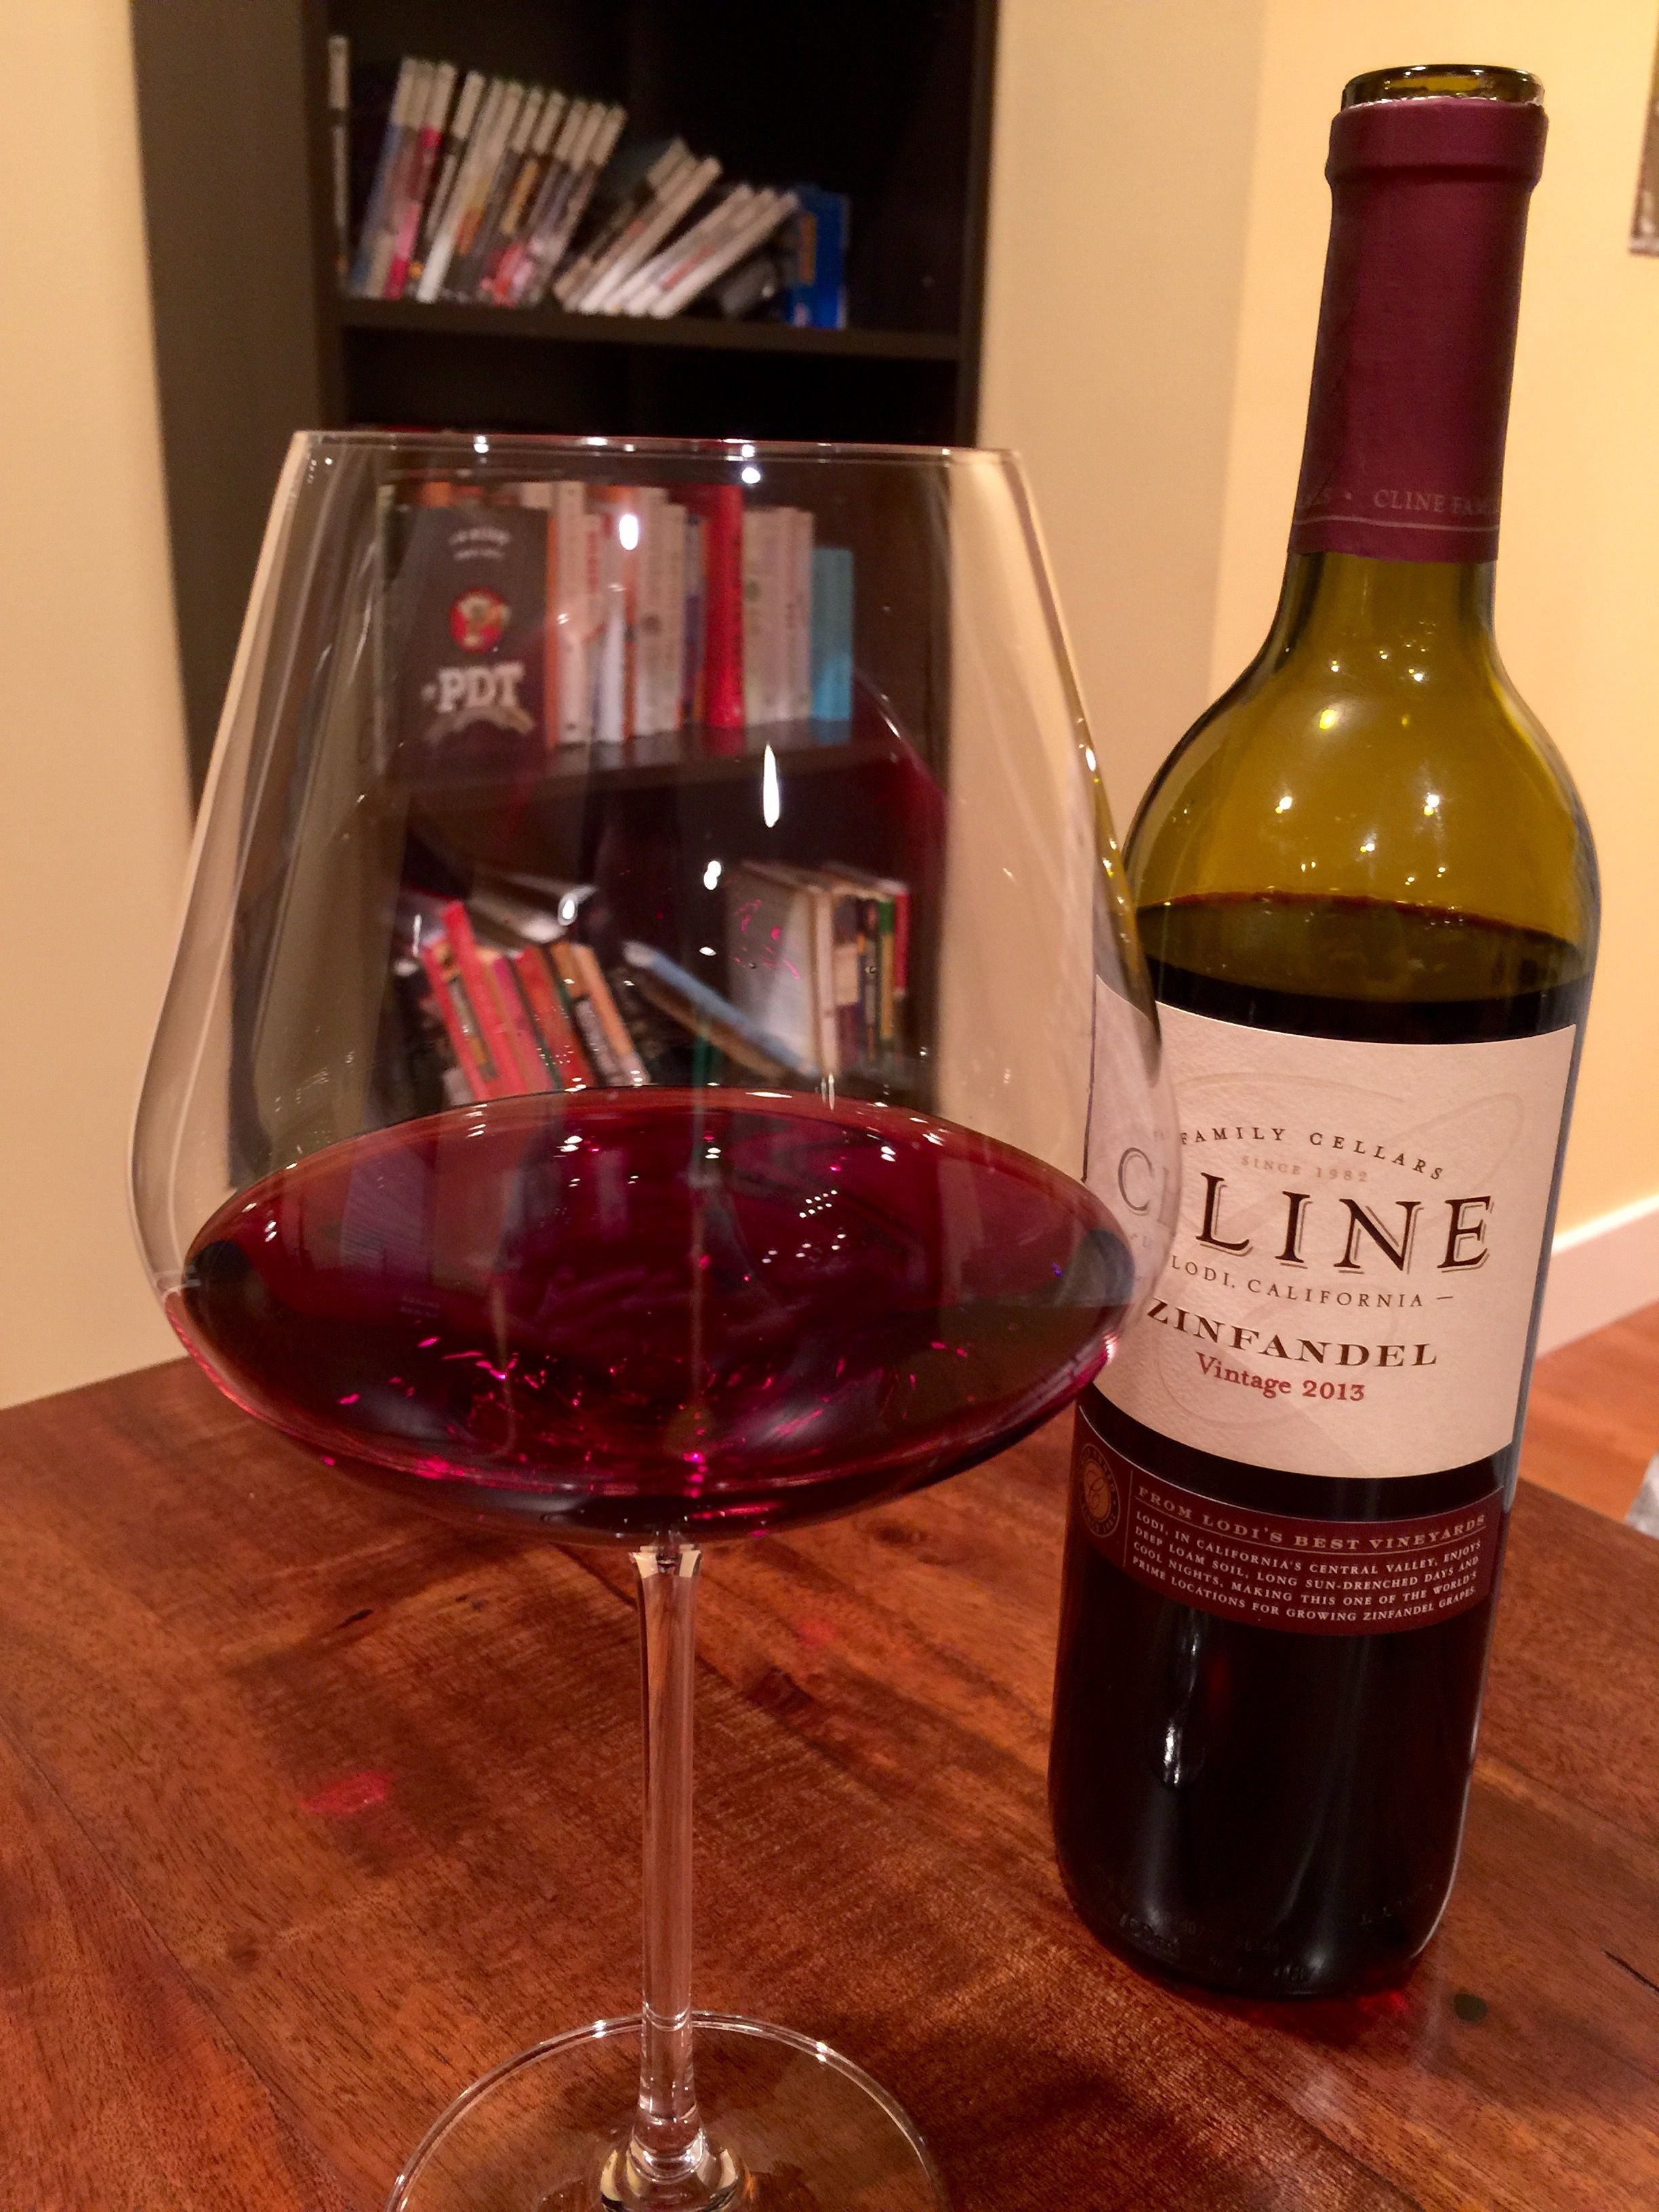 Cline Zinfandel 2013 Zinfandel Alcohol Red Wine